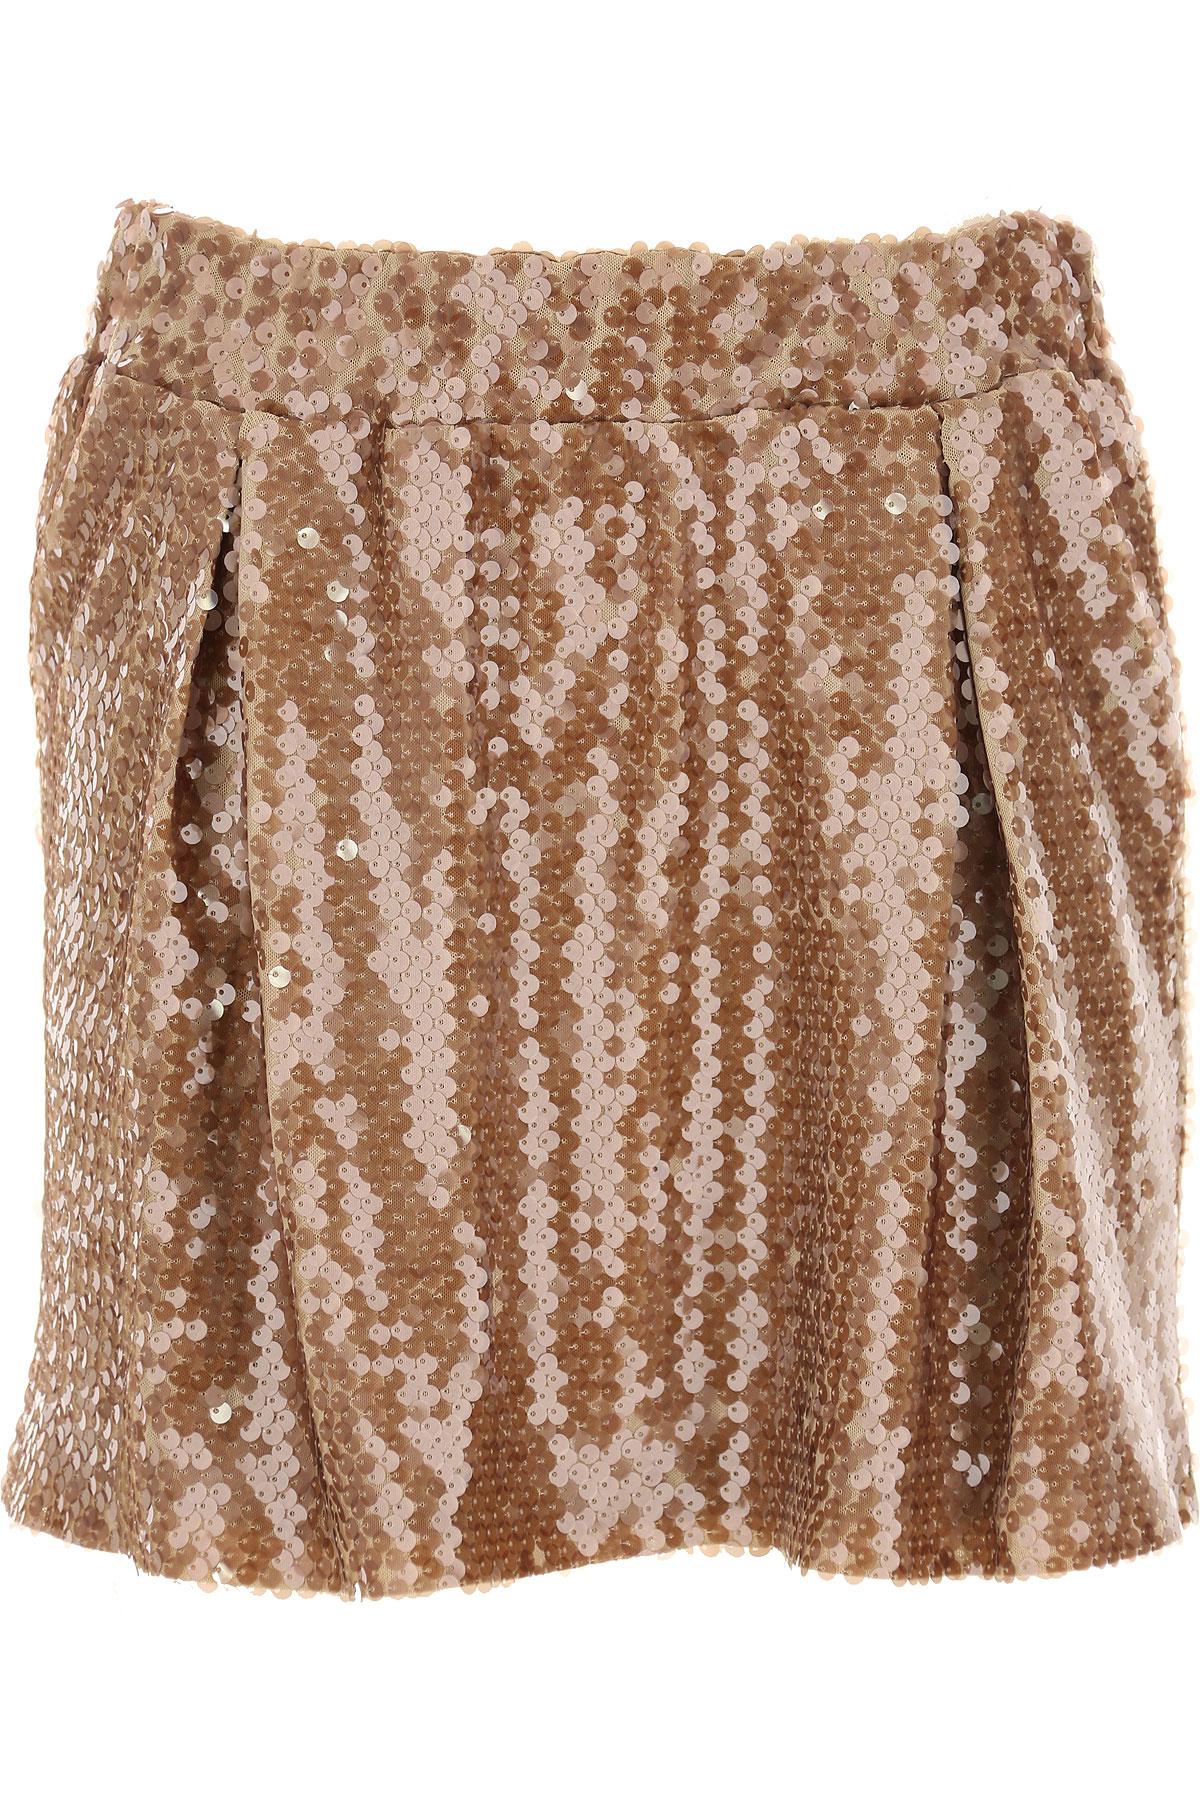 Aniye By Skirt for Women On Sale, Caramel, polyamide, 2019, 2 4 6